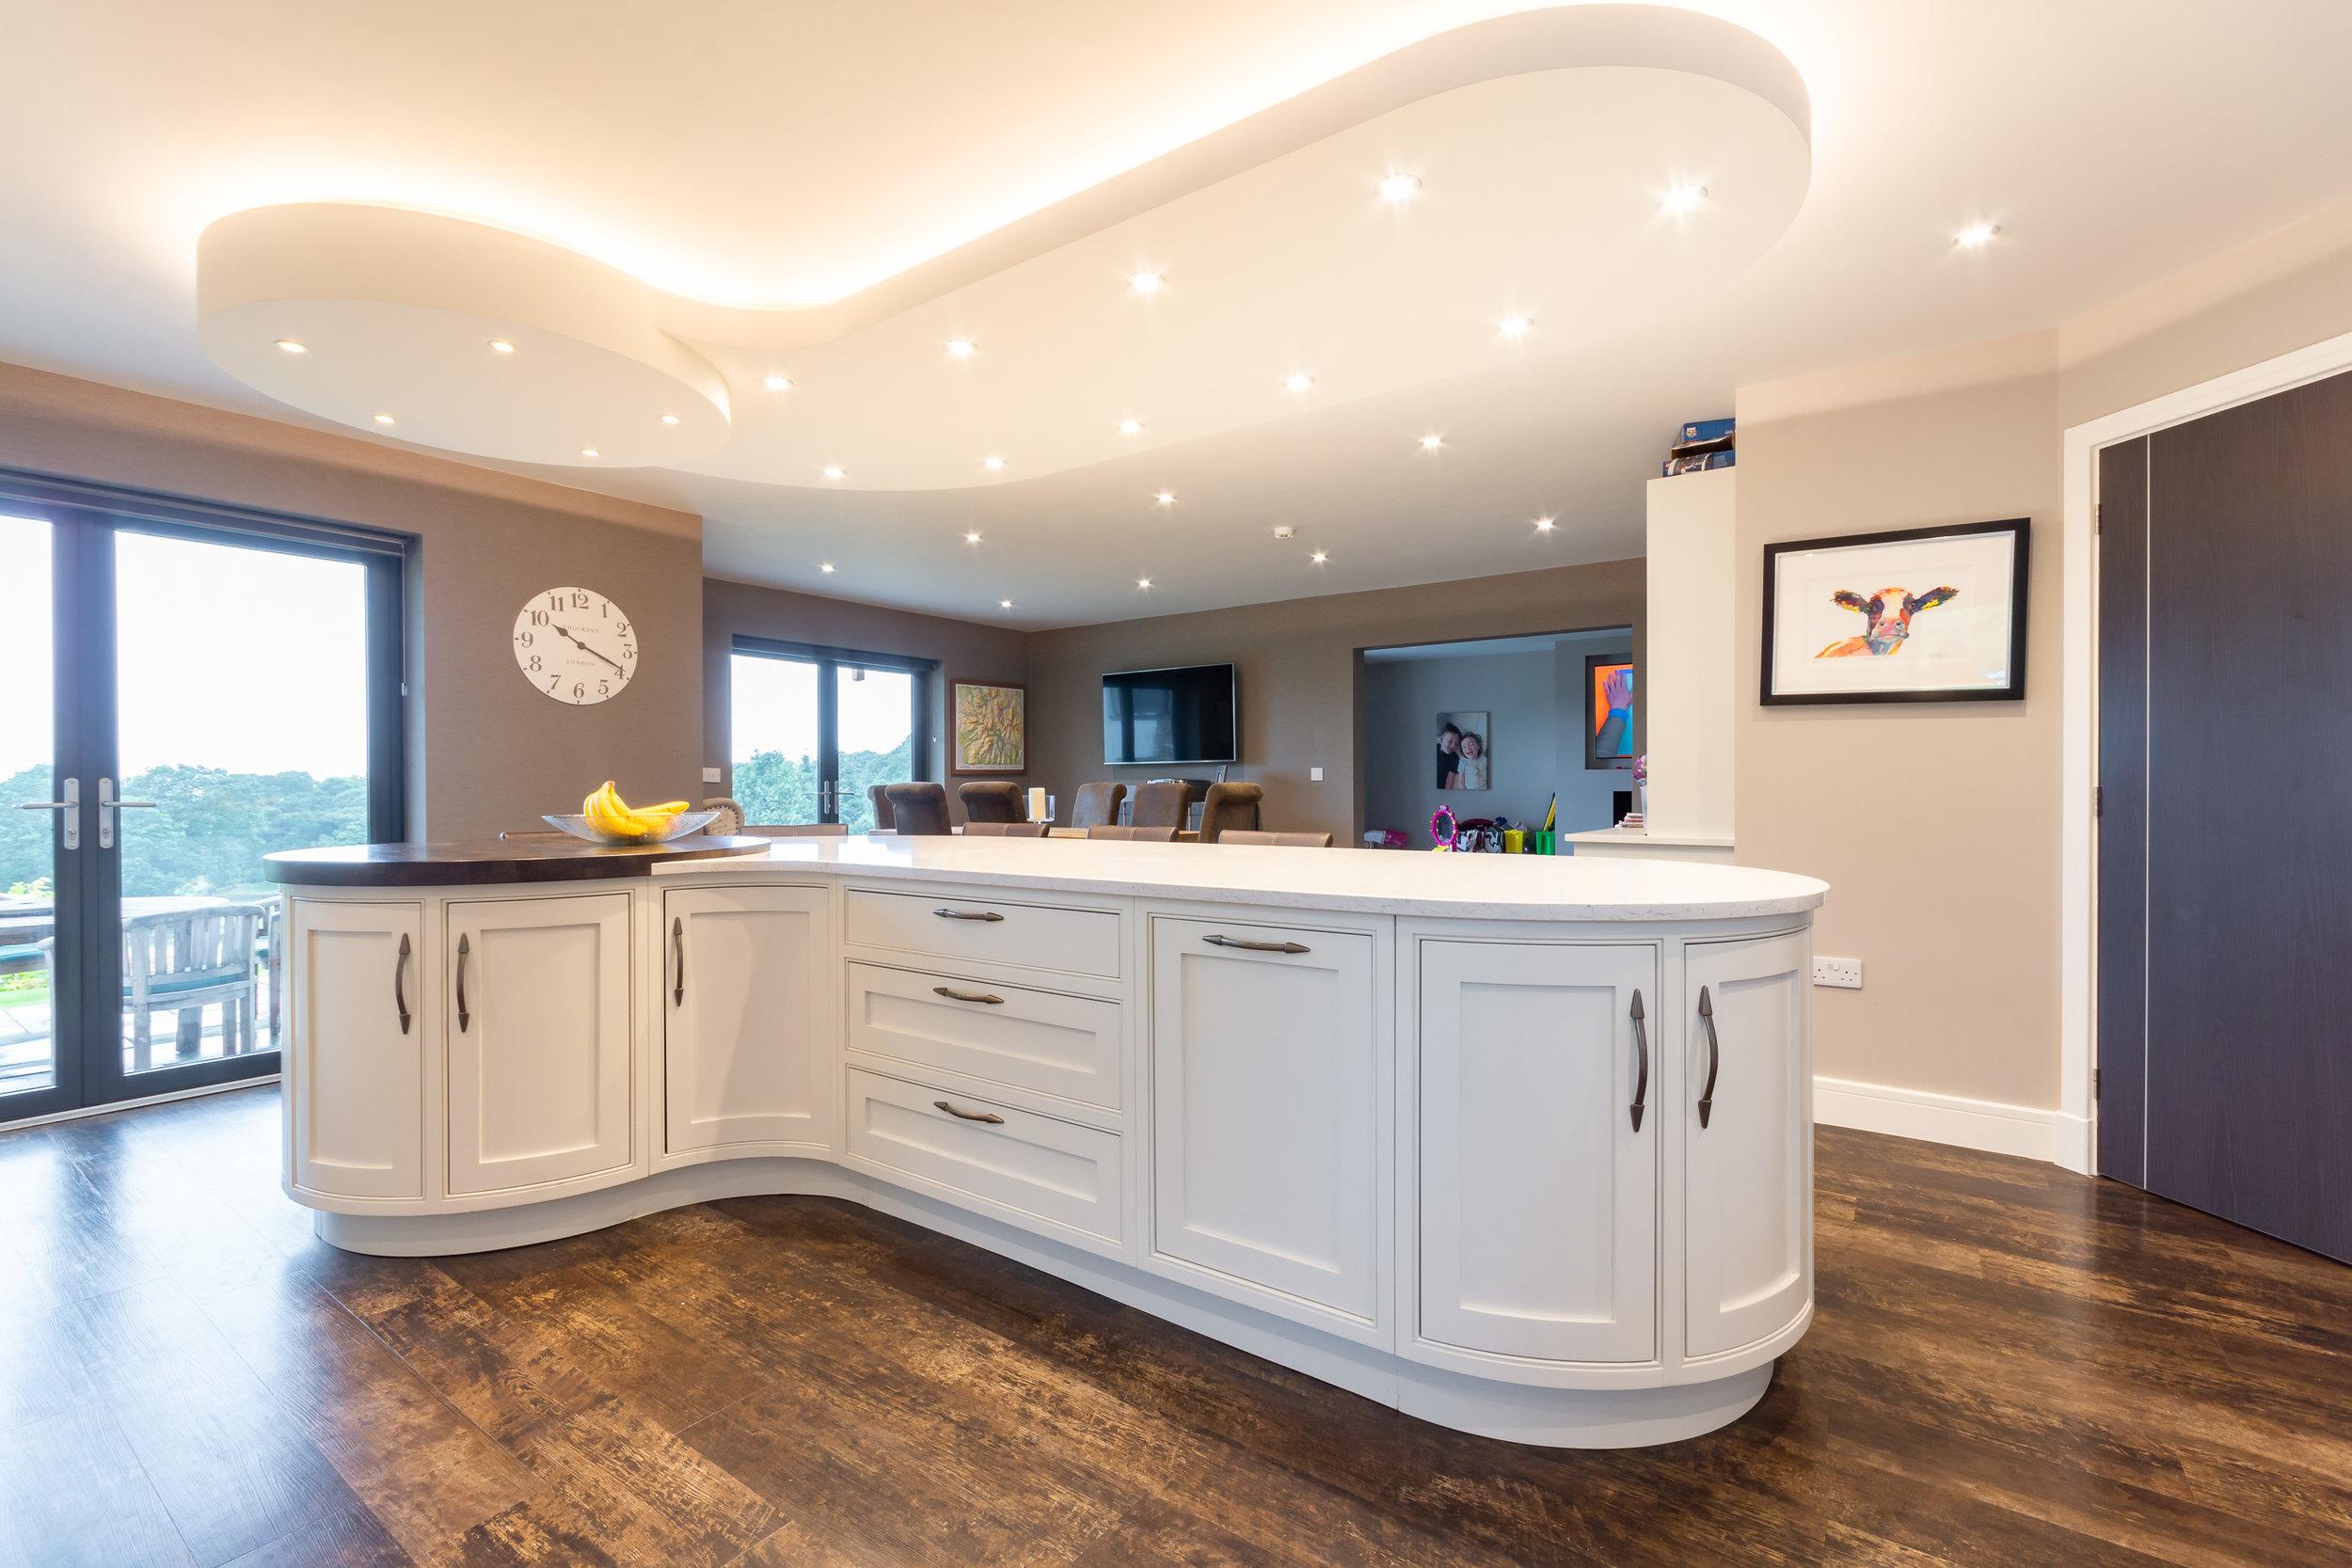 Webbs-Kitchens-Aimee-Curtin-00260.jpg